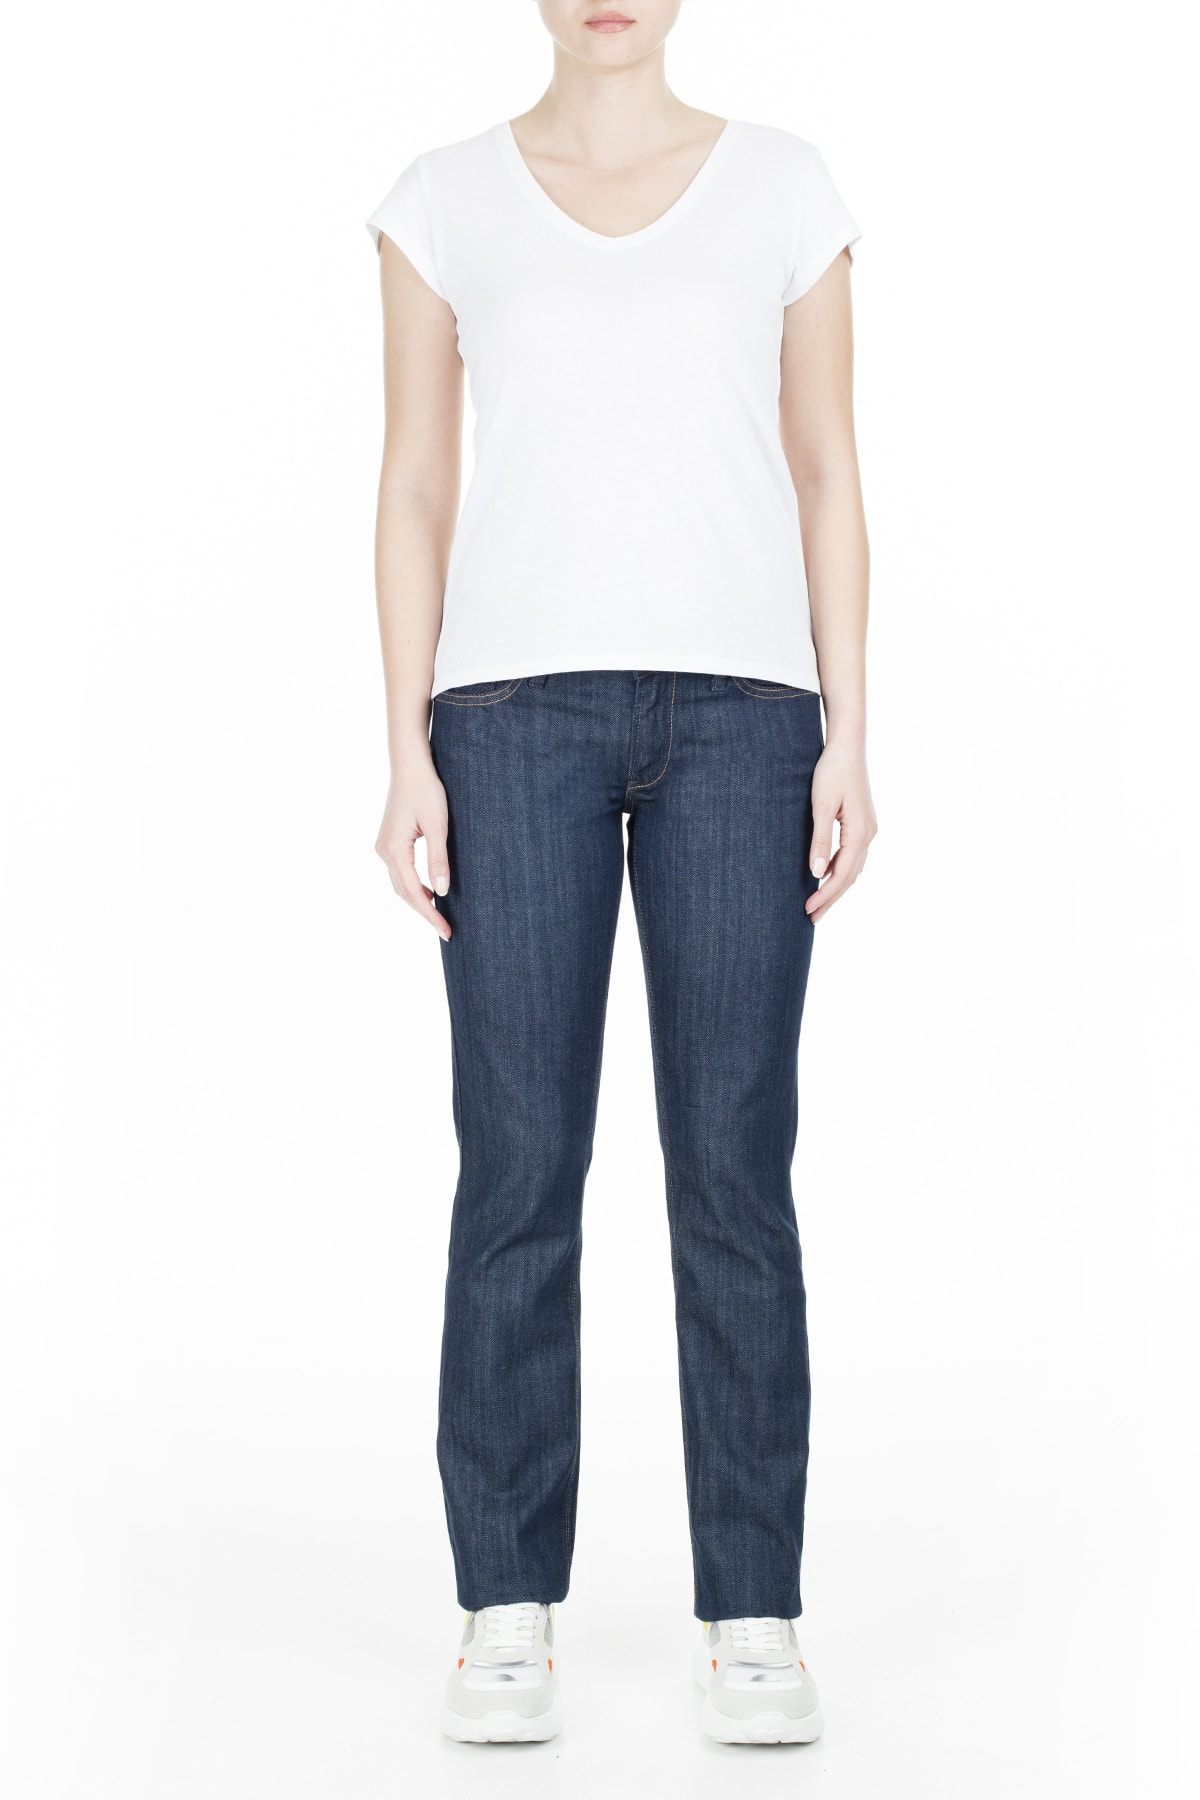 Replay Jeans Kadın Kot Pantolon Zoxwv591